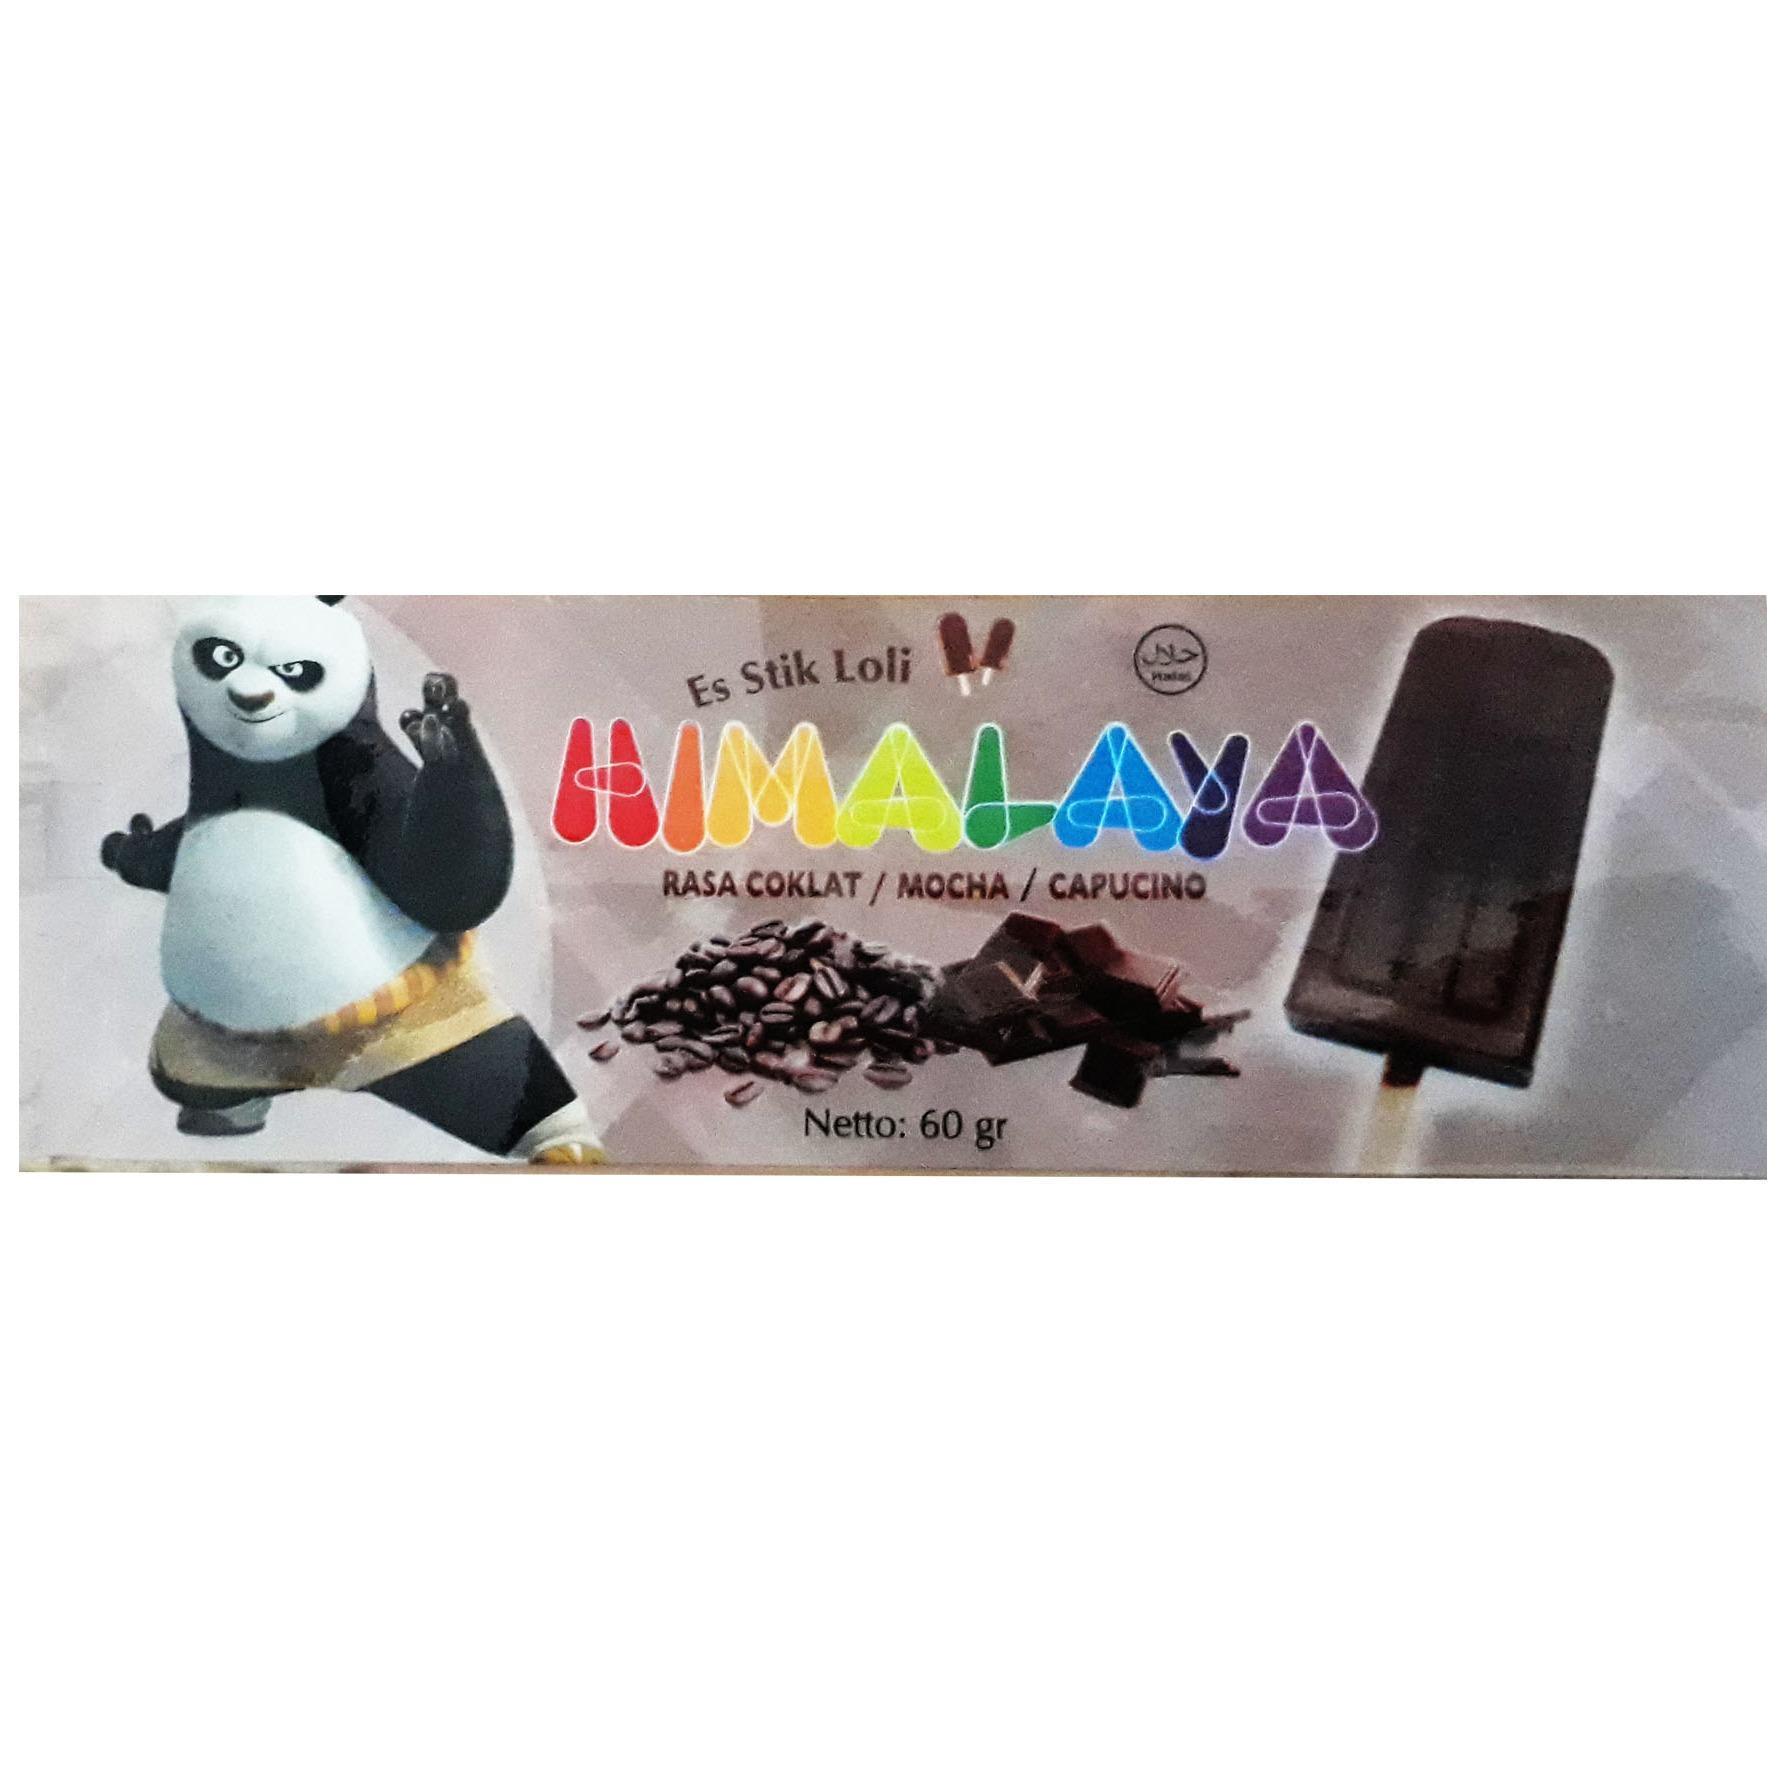 Sealer Mini Hand Perekat Plastik Super Handy Pengemas Makanan Rp125000 Sulawesi Selatan Jual Kemasan Es Krim Lilin